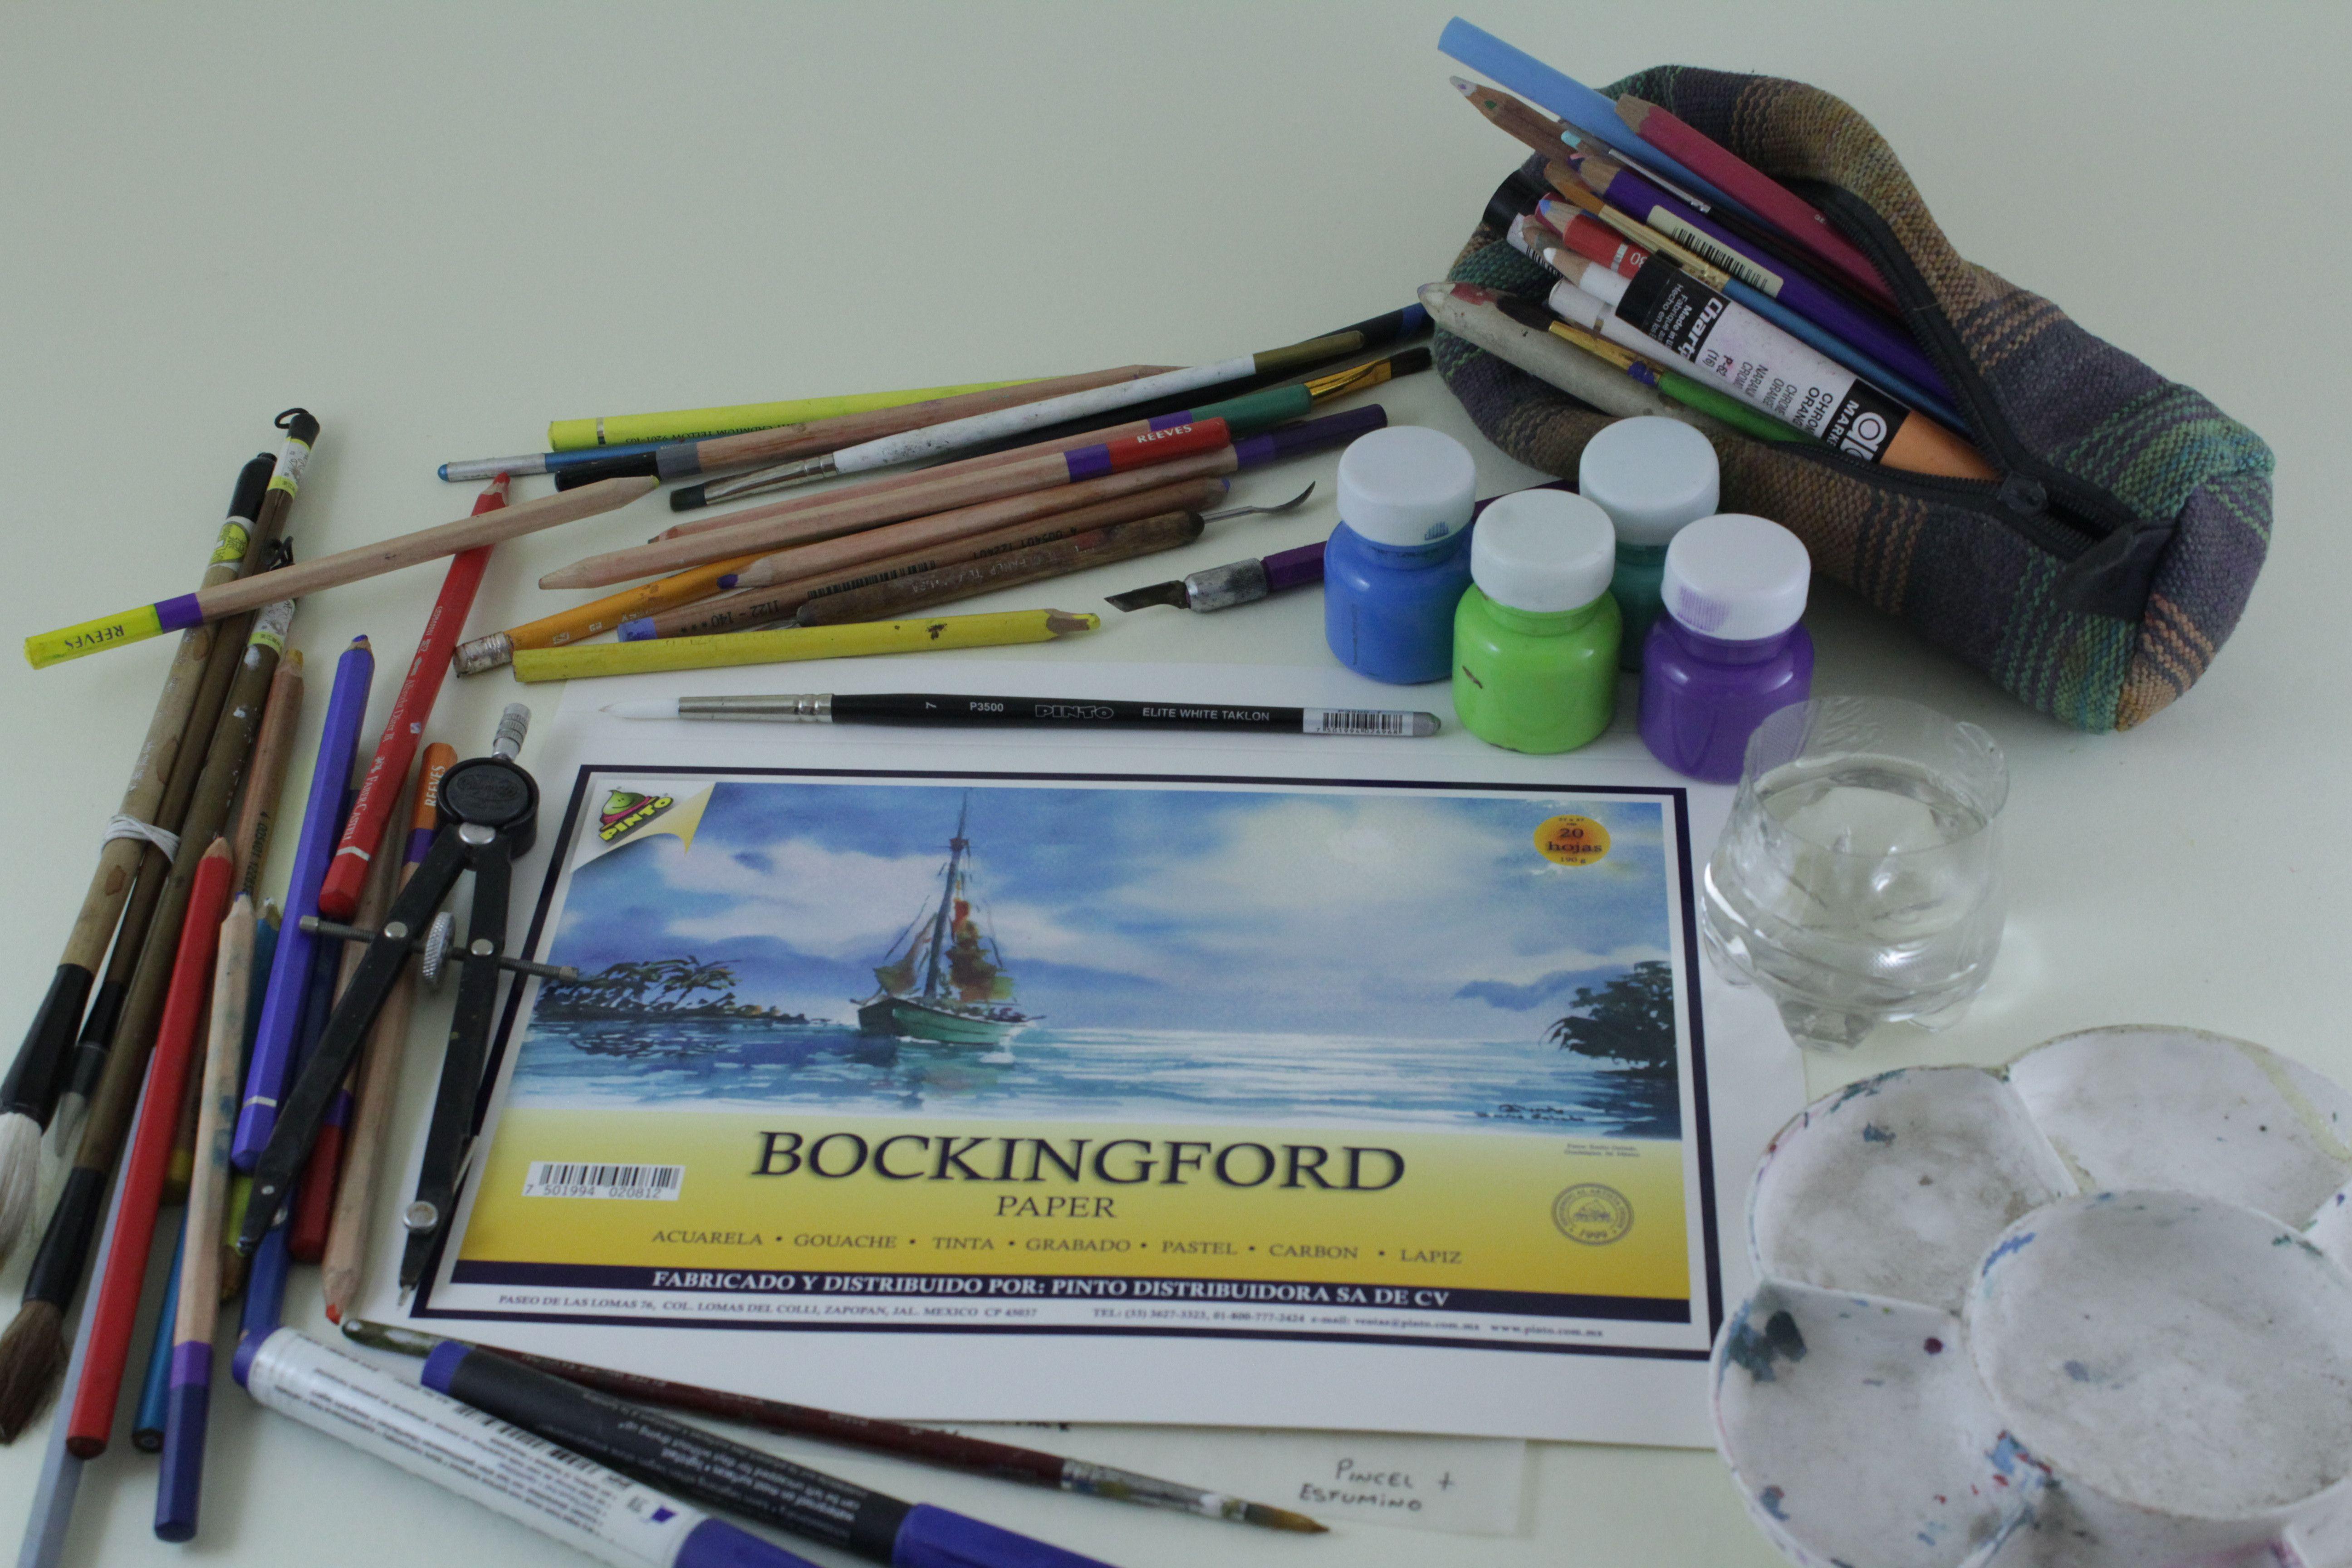 Block Para Diversas Tecnicas De Dibujo Y Pintura Mp3 Player Electronic Products Players